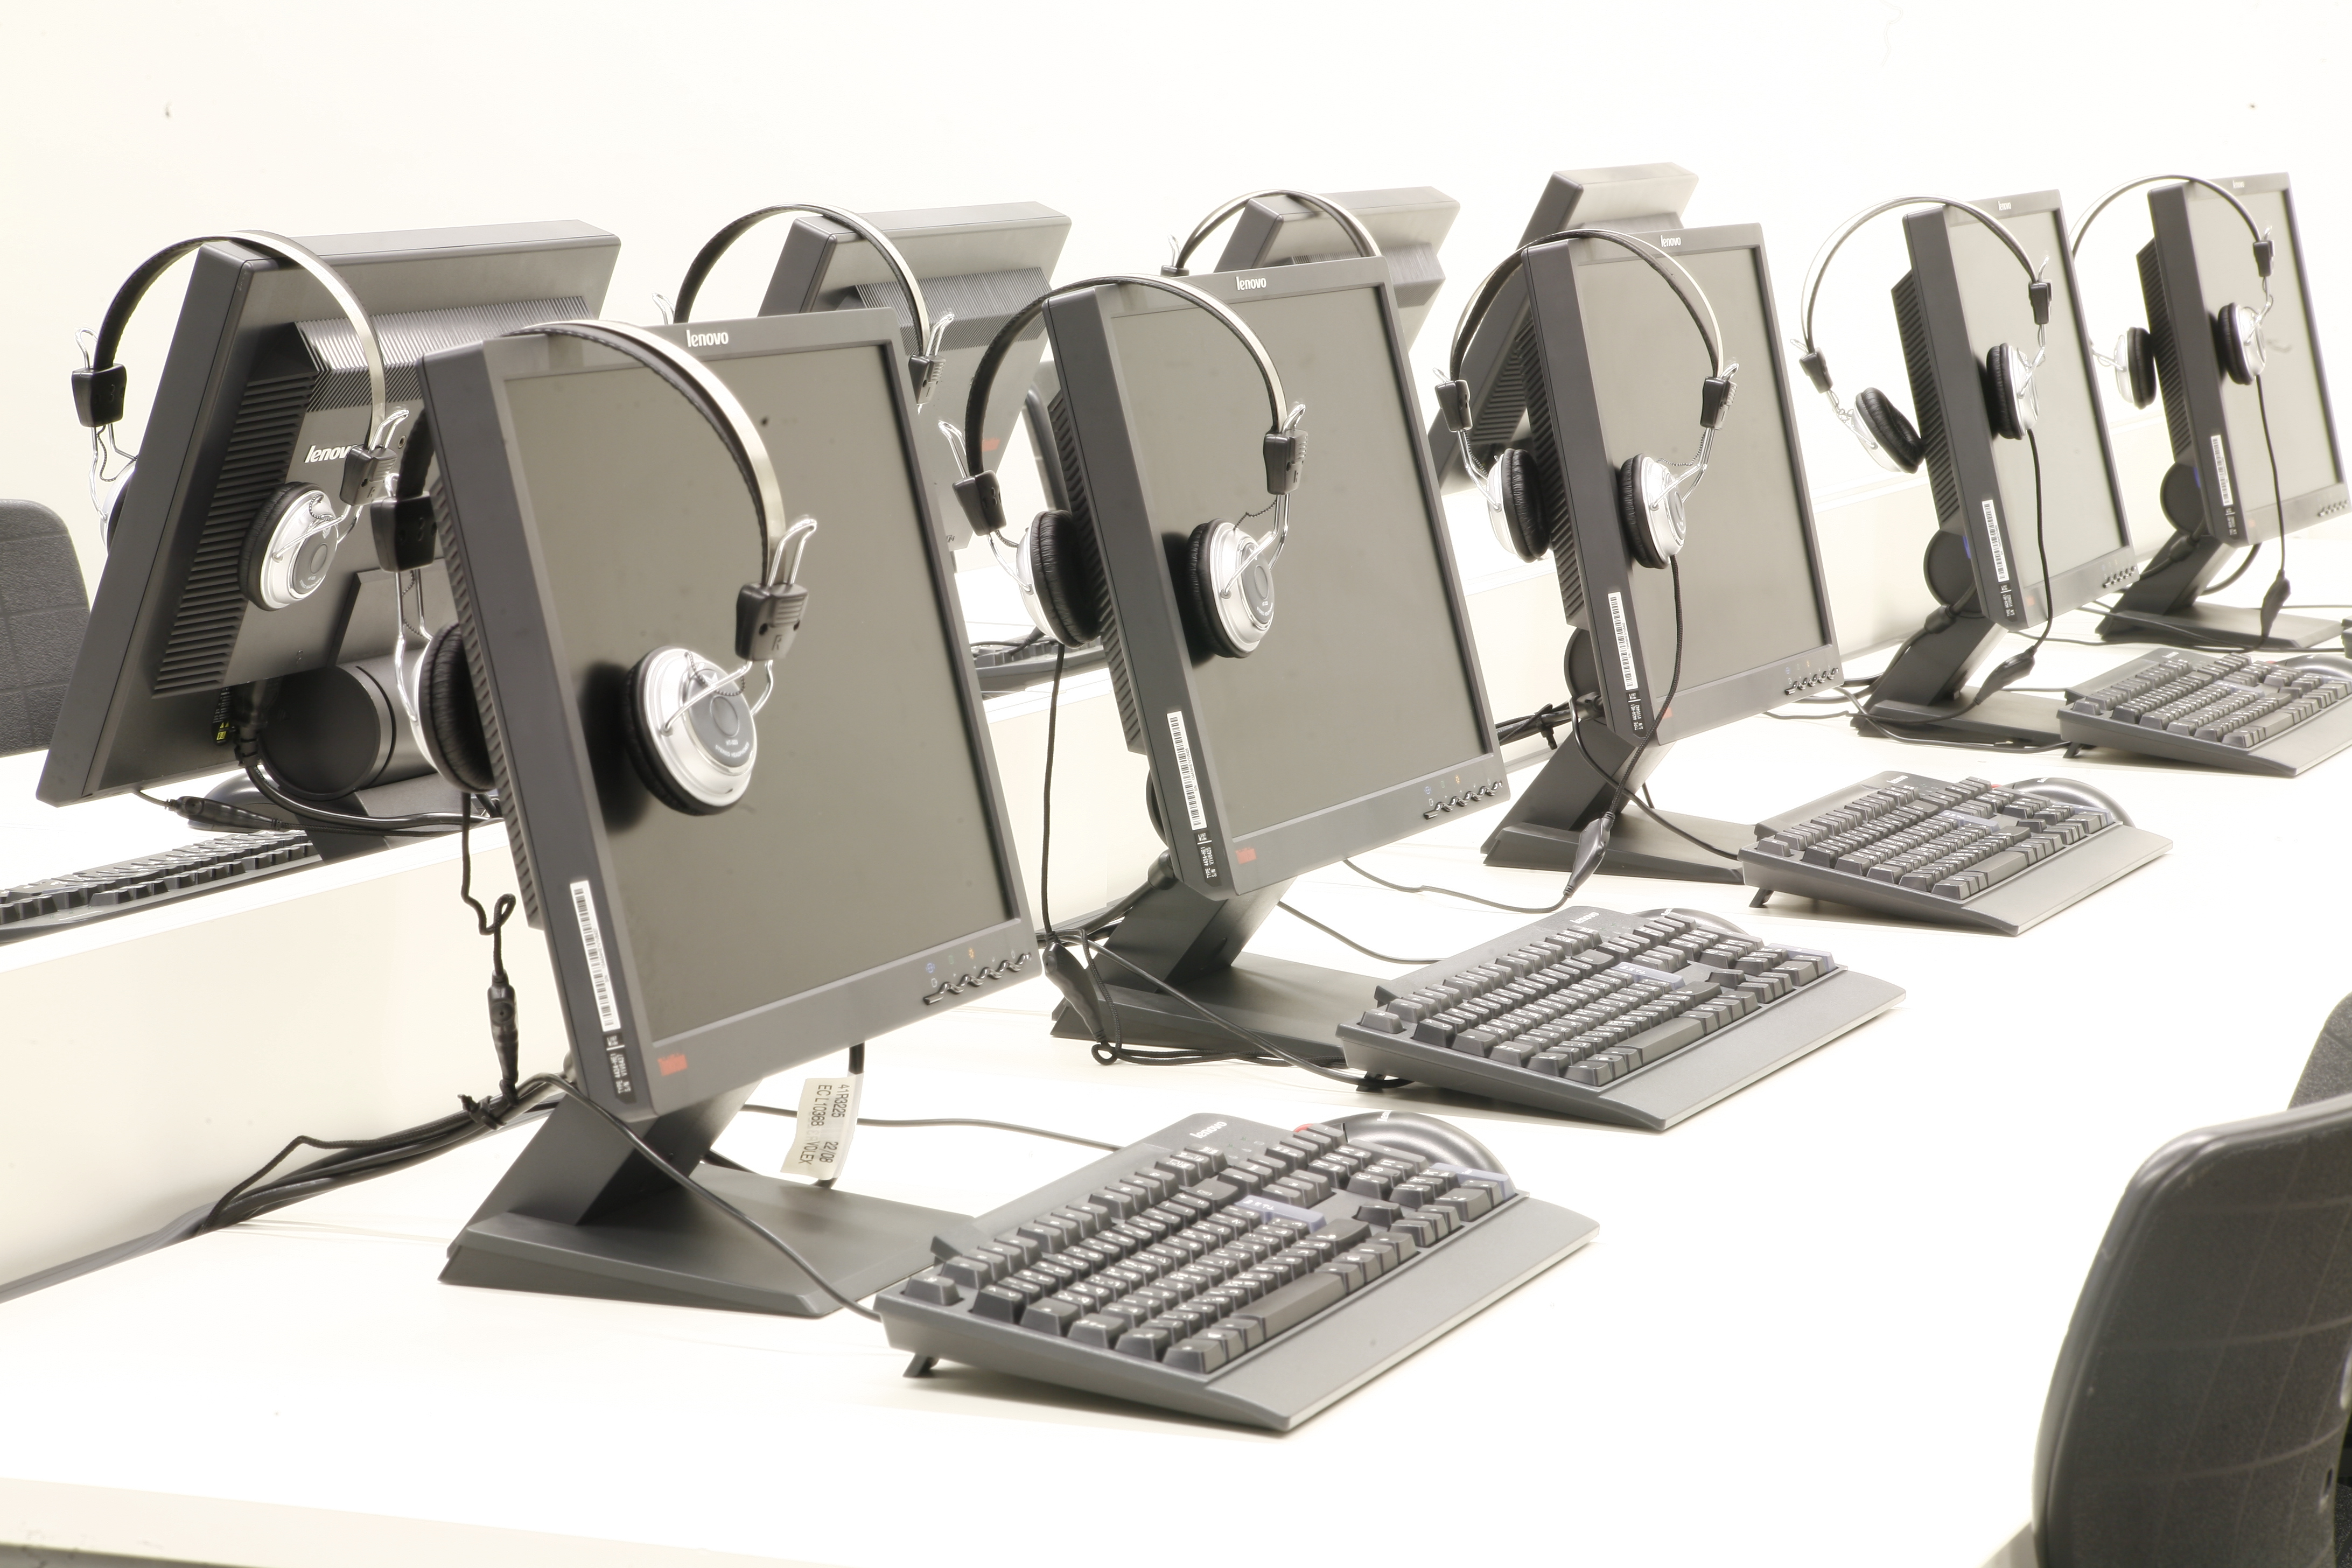 3 Common IT Help Desk Support Challenges